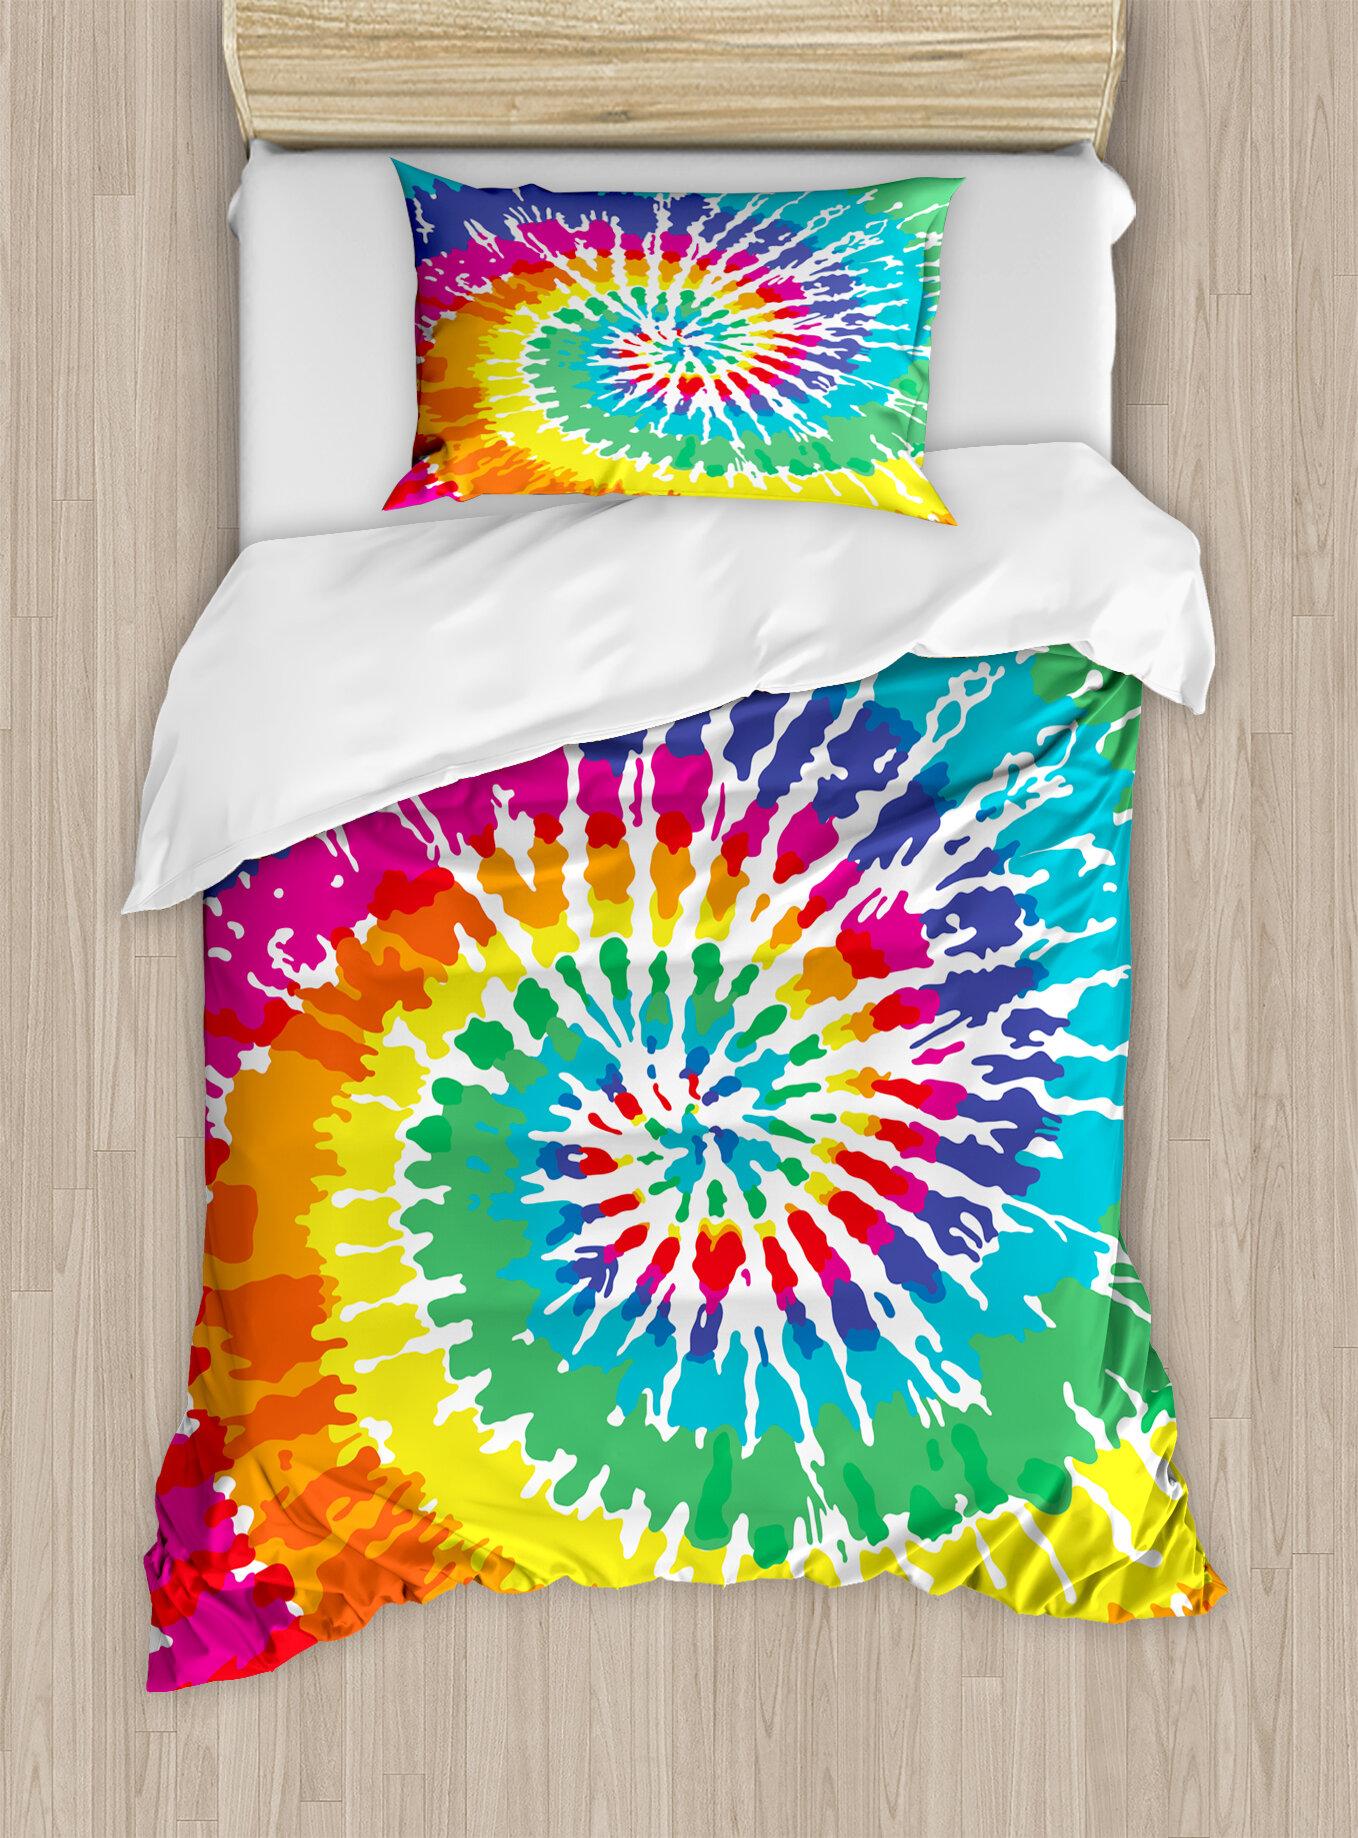 Bedding Zodiac Reversible Sky Indigo Duvet Cover Quilt Covers Pillowcases Bedding Sets Home Furniture Diy Omnitel Com Na